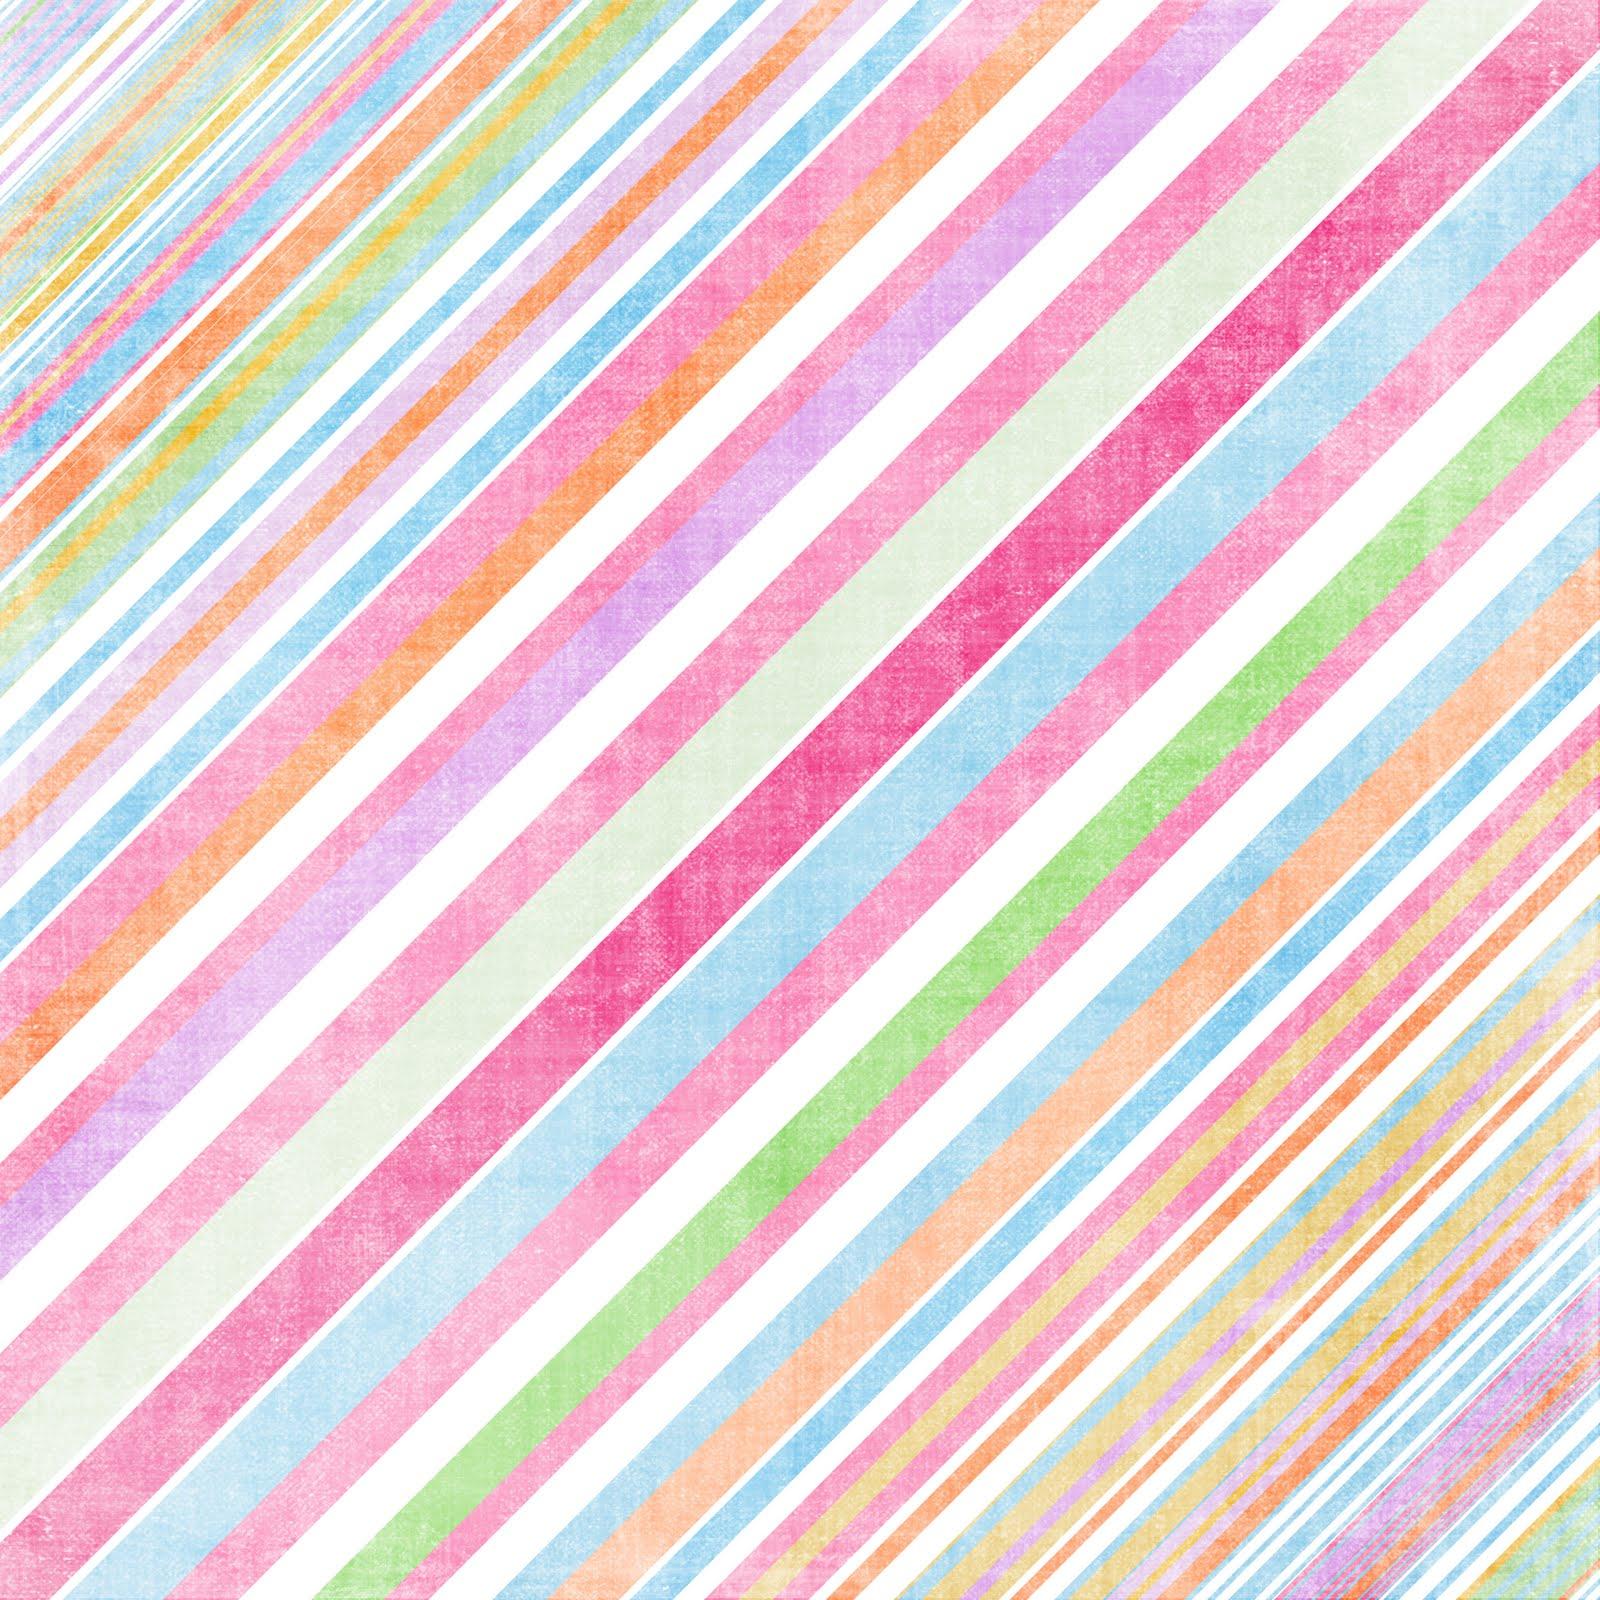 http://2.bp.blogspot.com/_omiG-WZLpN4/TMwywcCuZuI/AAAAAAAABHU/0Gl0tXO_1z0/s1600/SP_SpringBreeze_Paper_Stripes.jpg